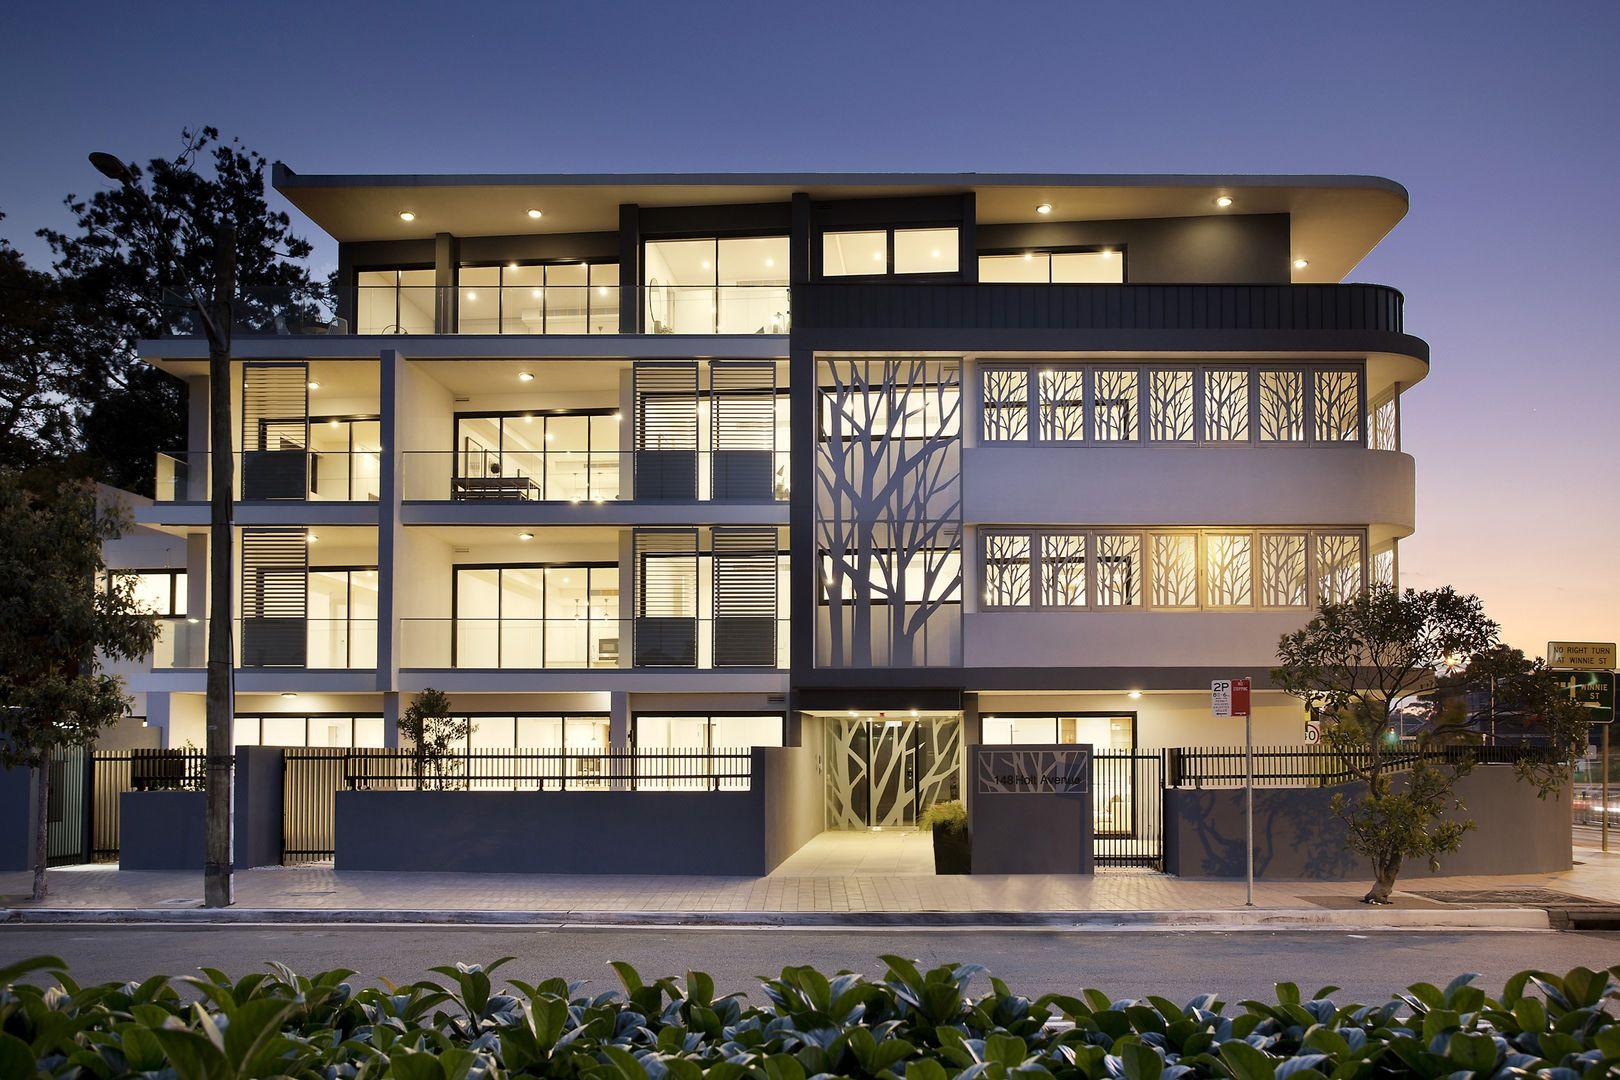 148-150 Holt Avenue, Cremorne, NSW 2090, Image 0